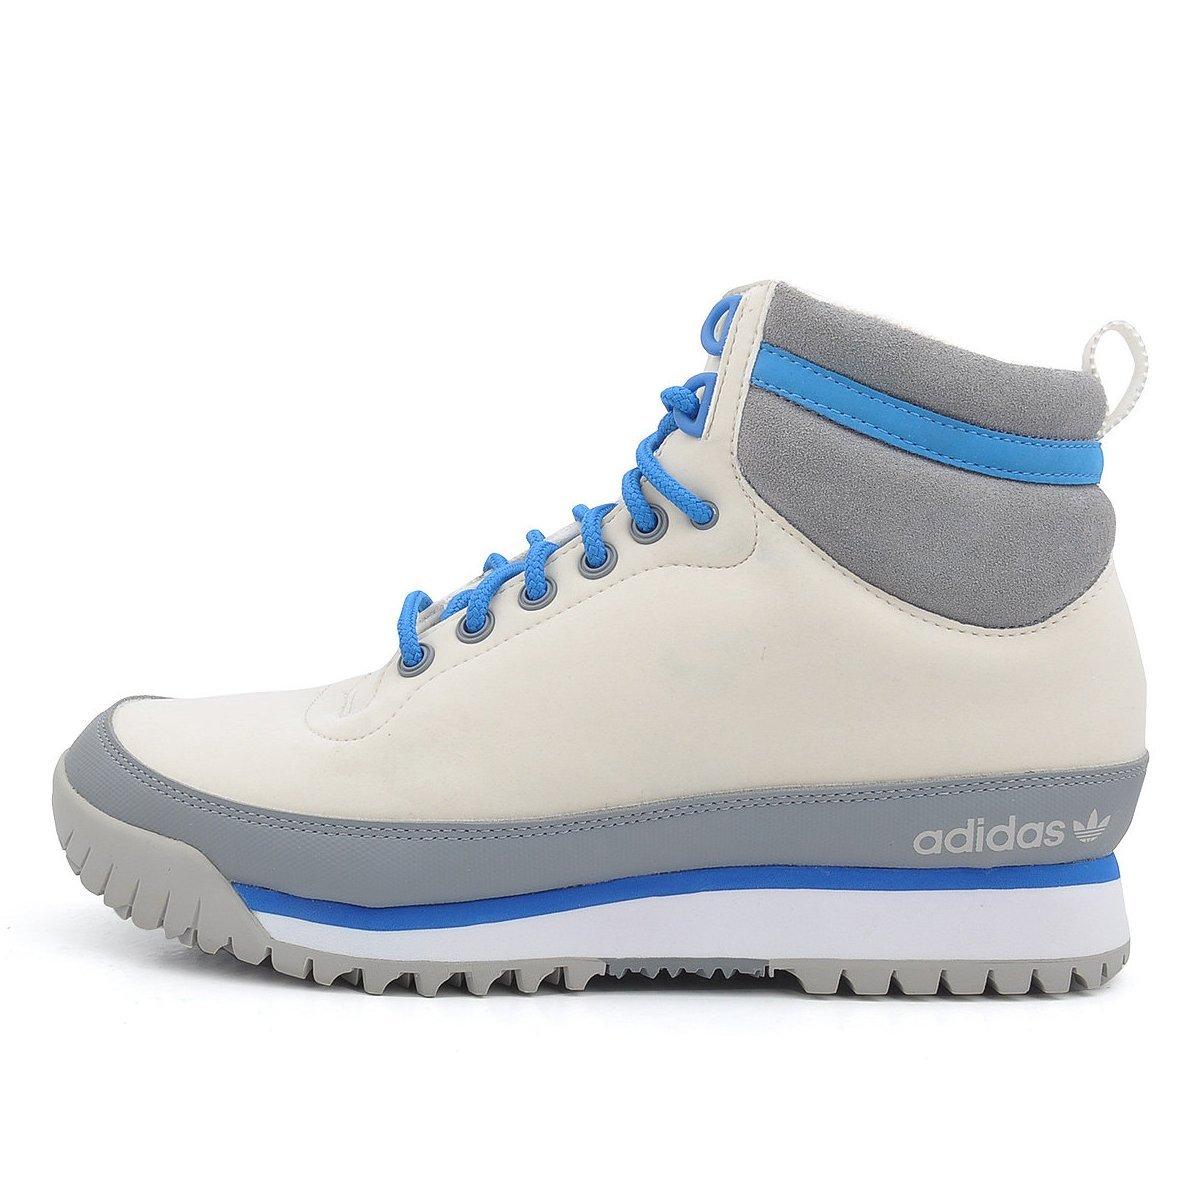 Zx Boot Trail Beigegraublau Baltora Adidas Outdoorschuhe Stiefel NnPZO0X8wk